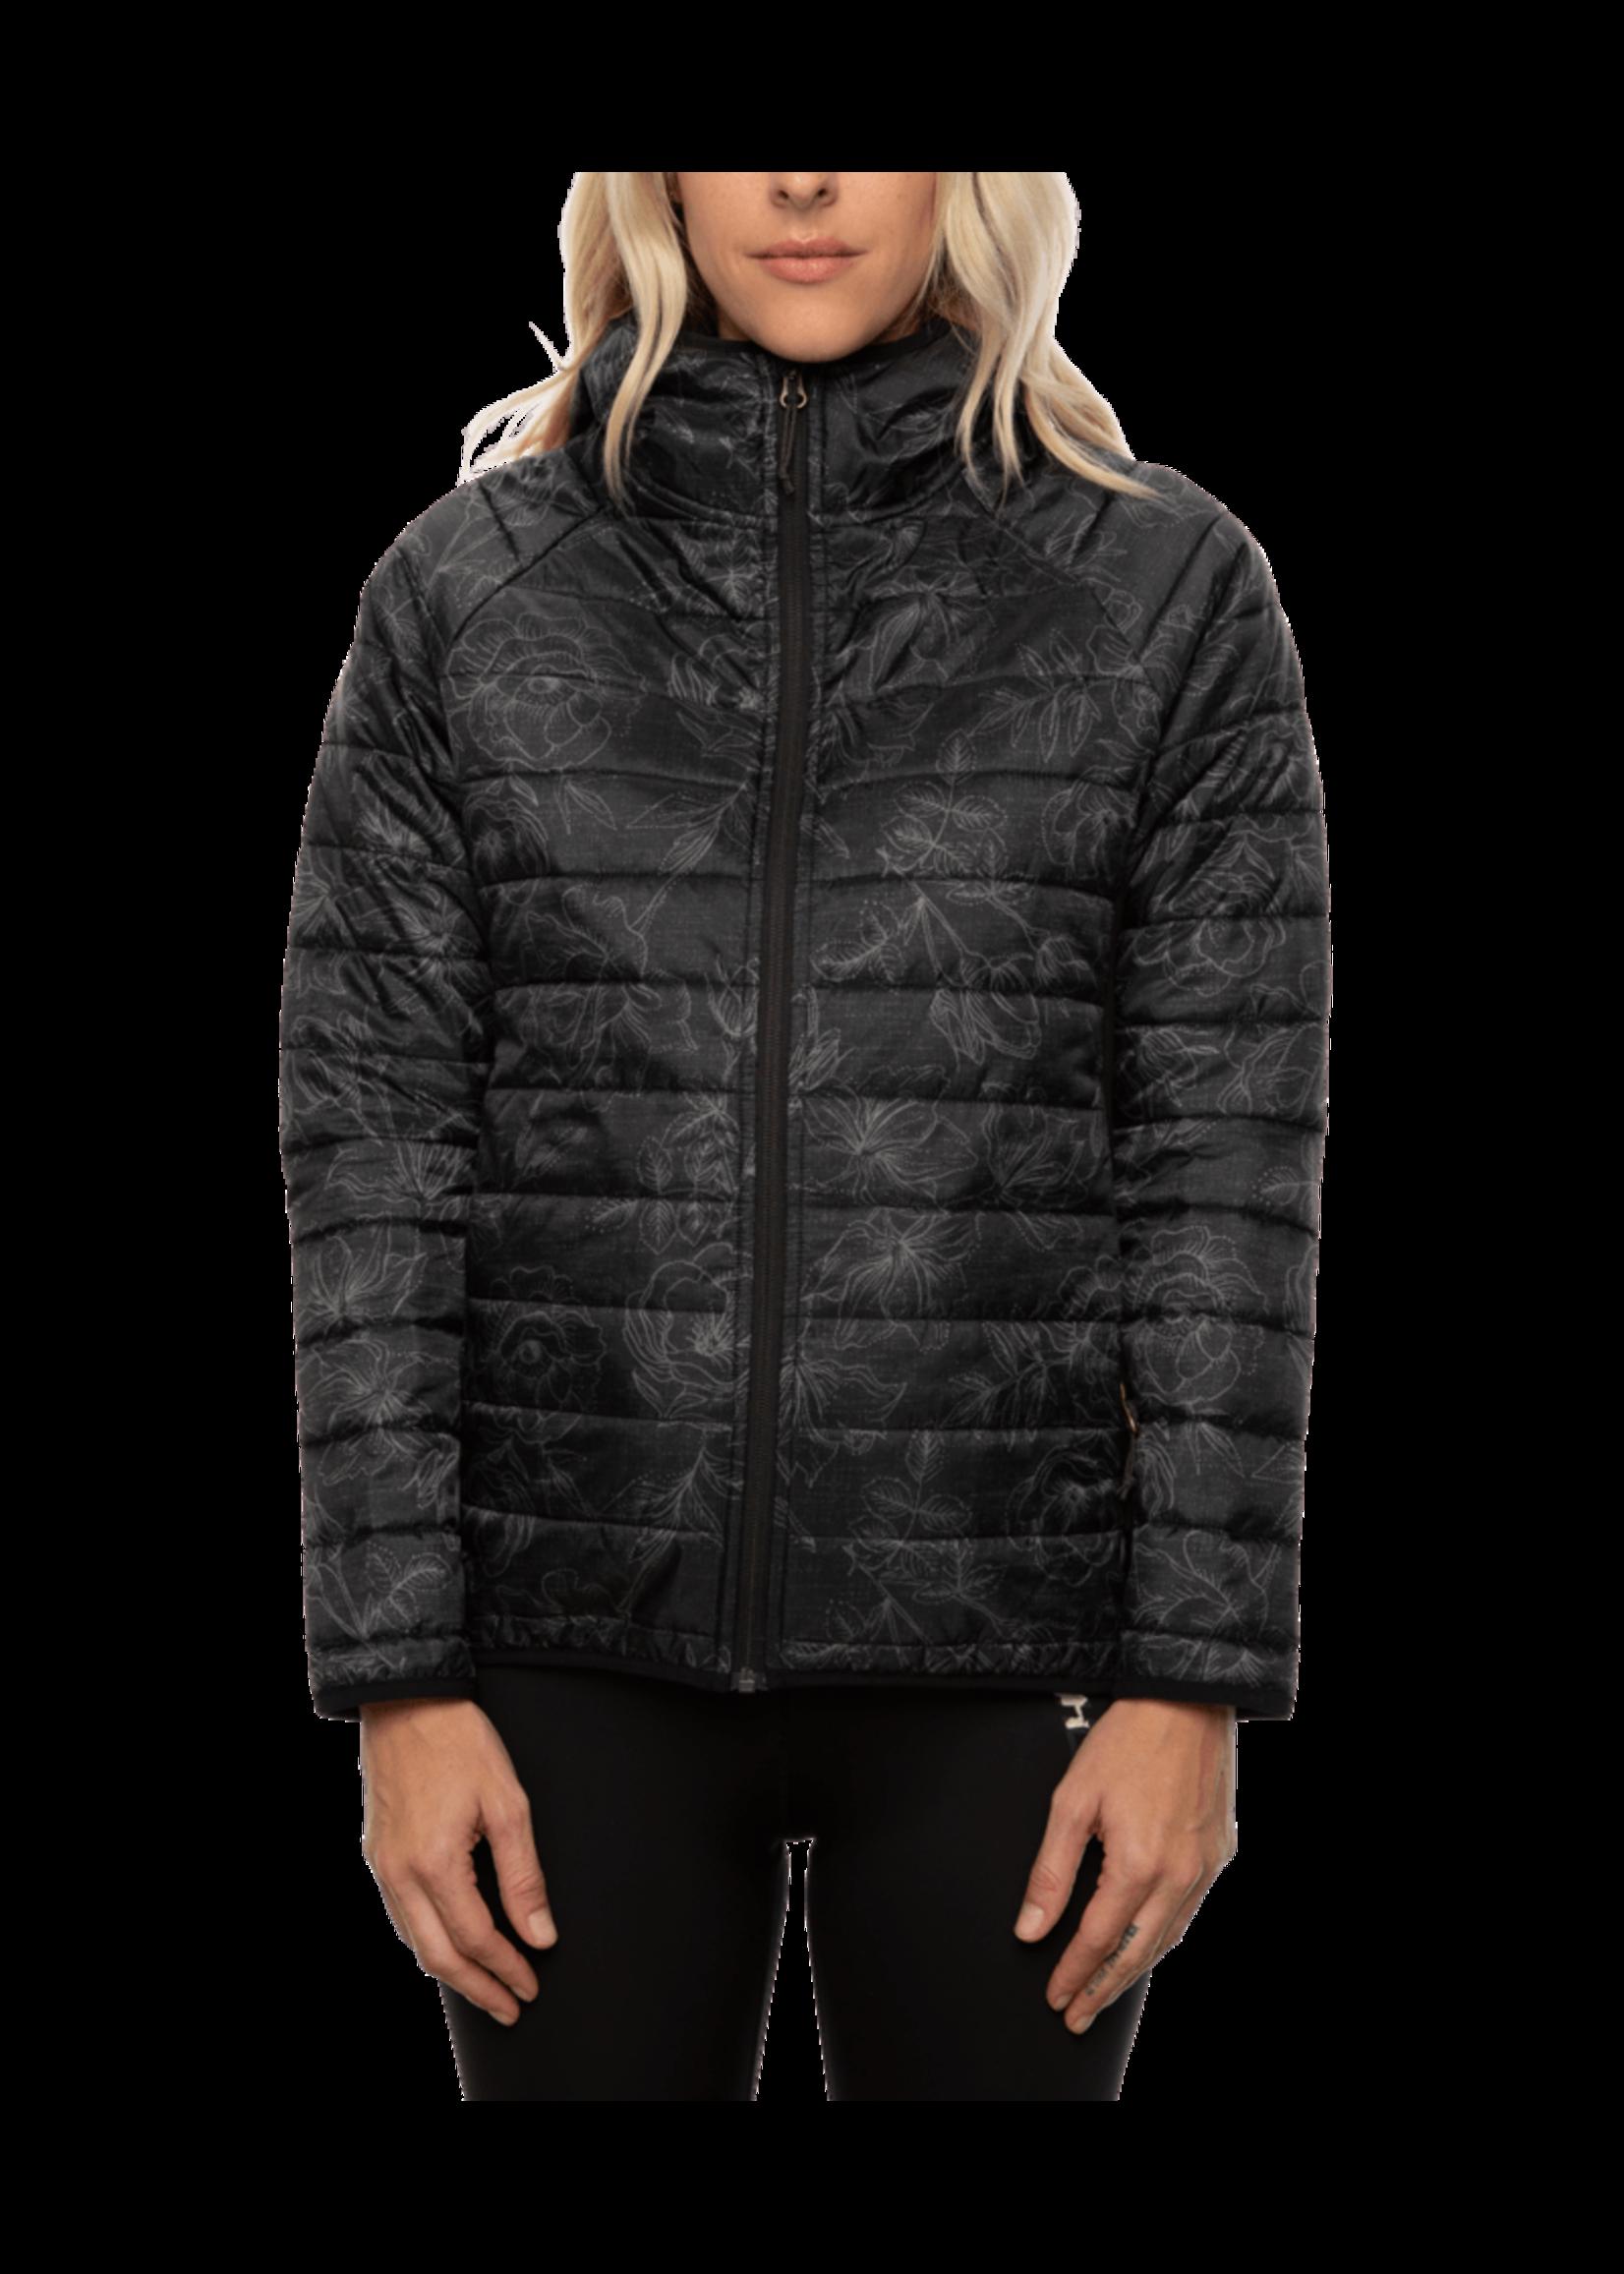 686 686 Thermal Puff Hood Jacket